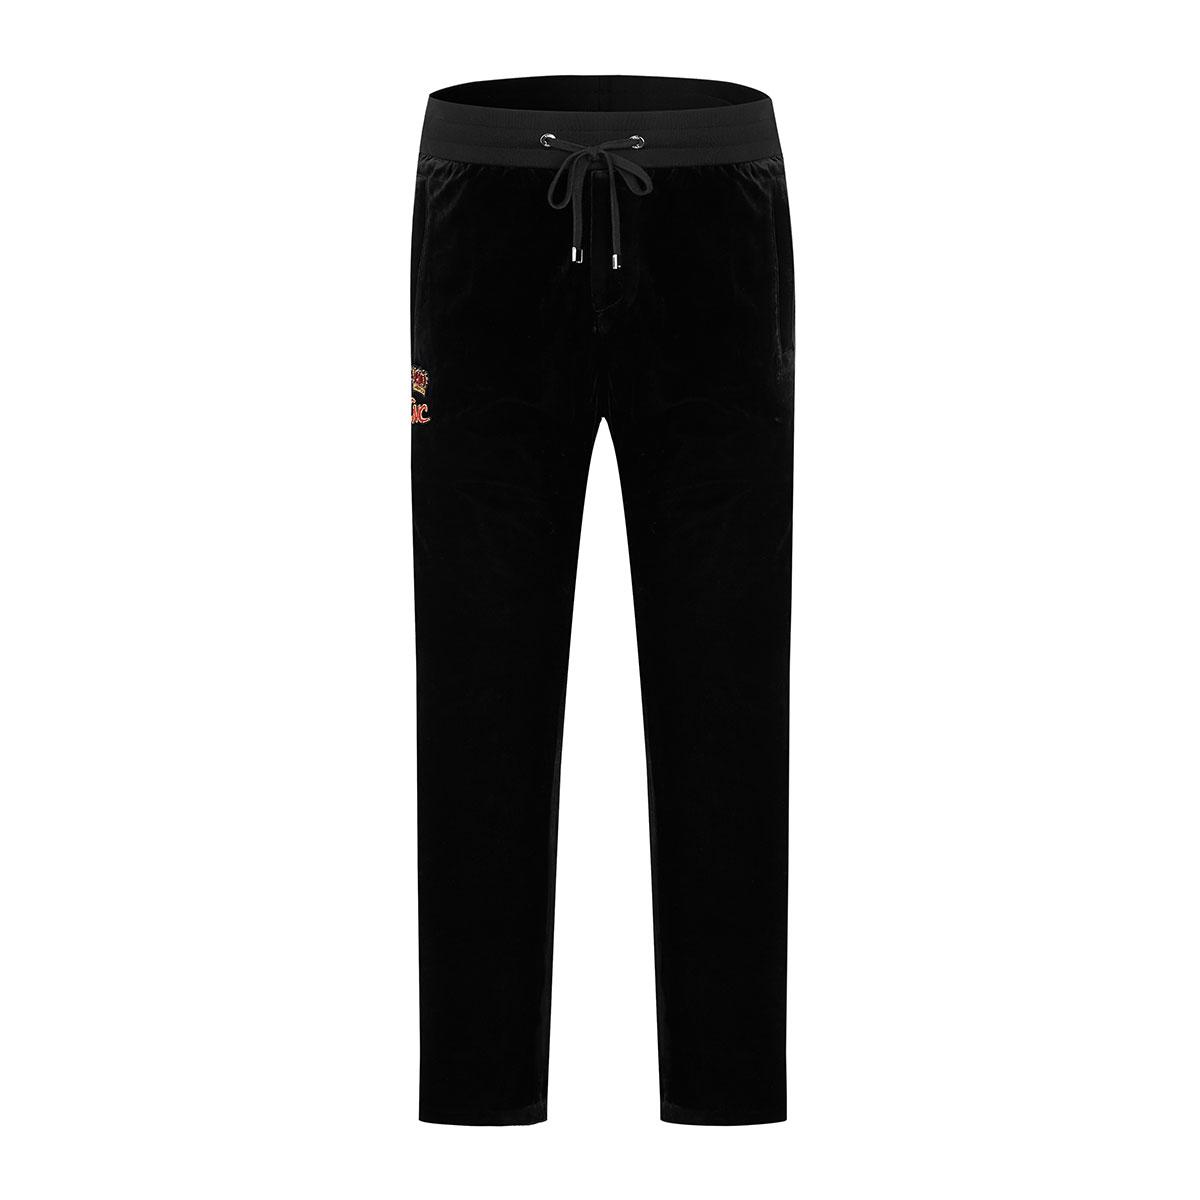 C#039N#039CCaposNaposC男式简约皇冠字母图案舒适系带休闲裤8110393051-01